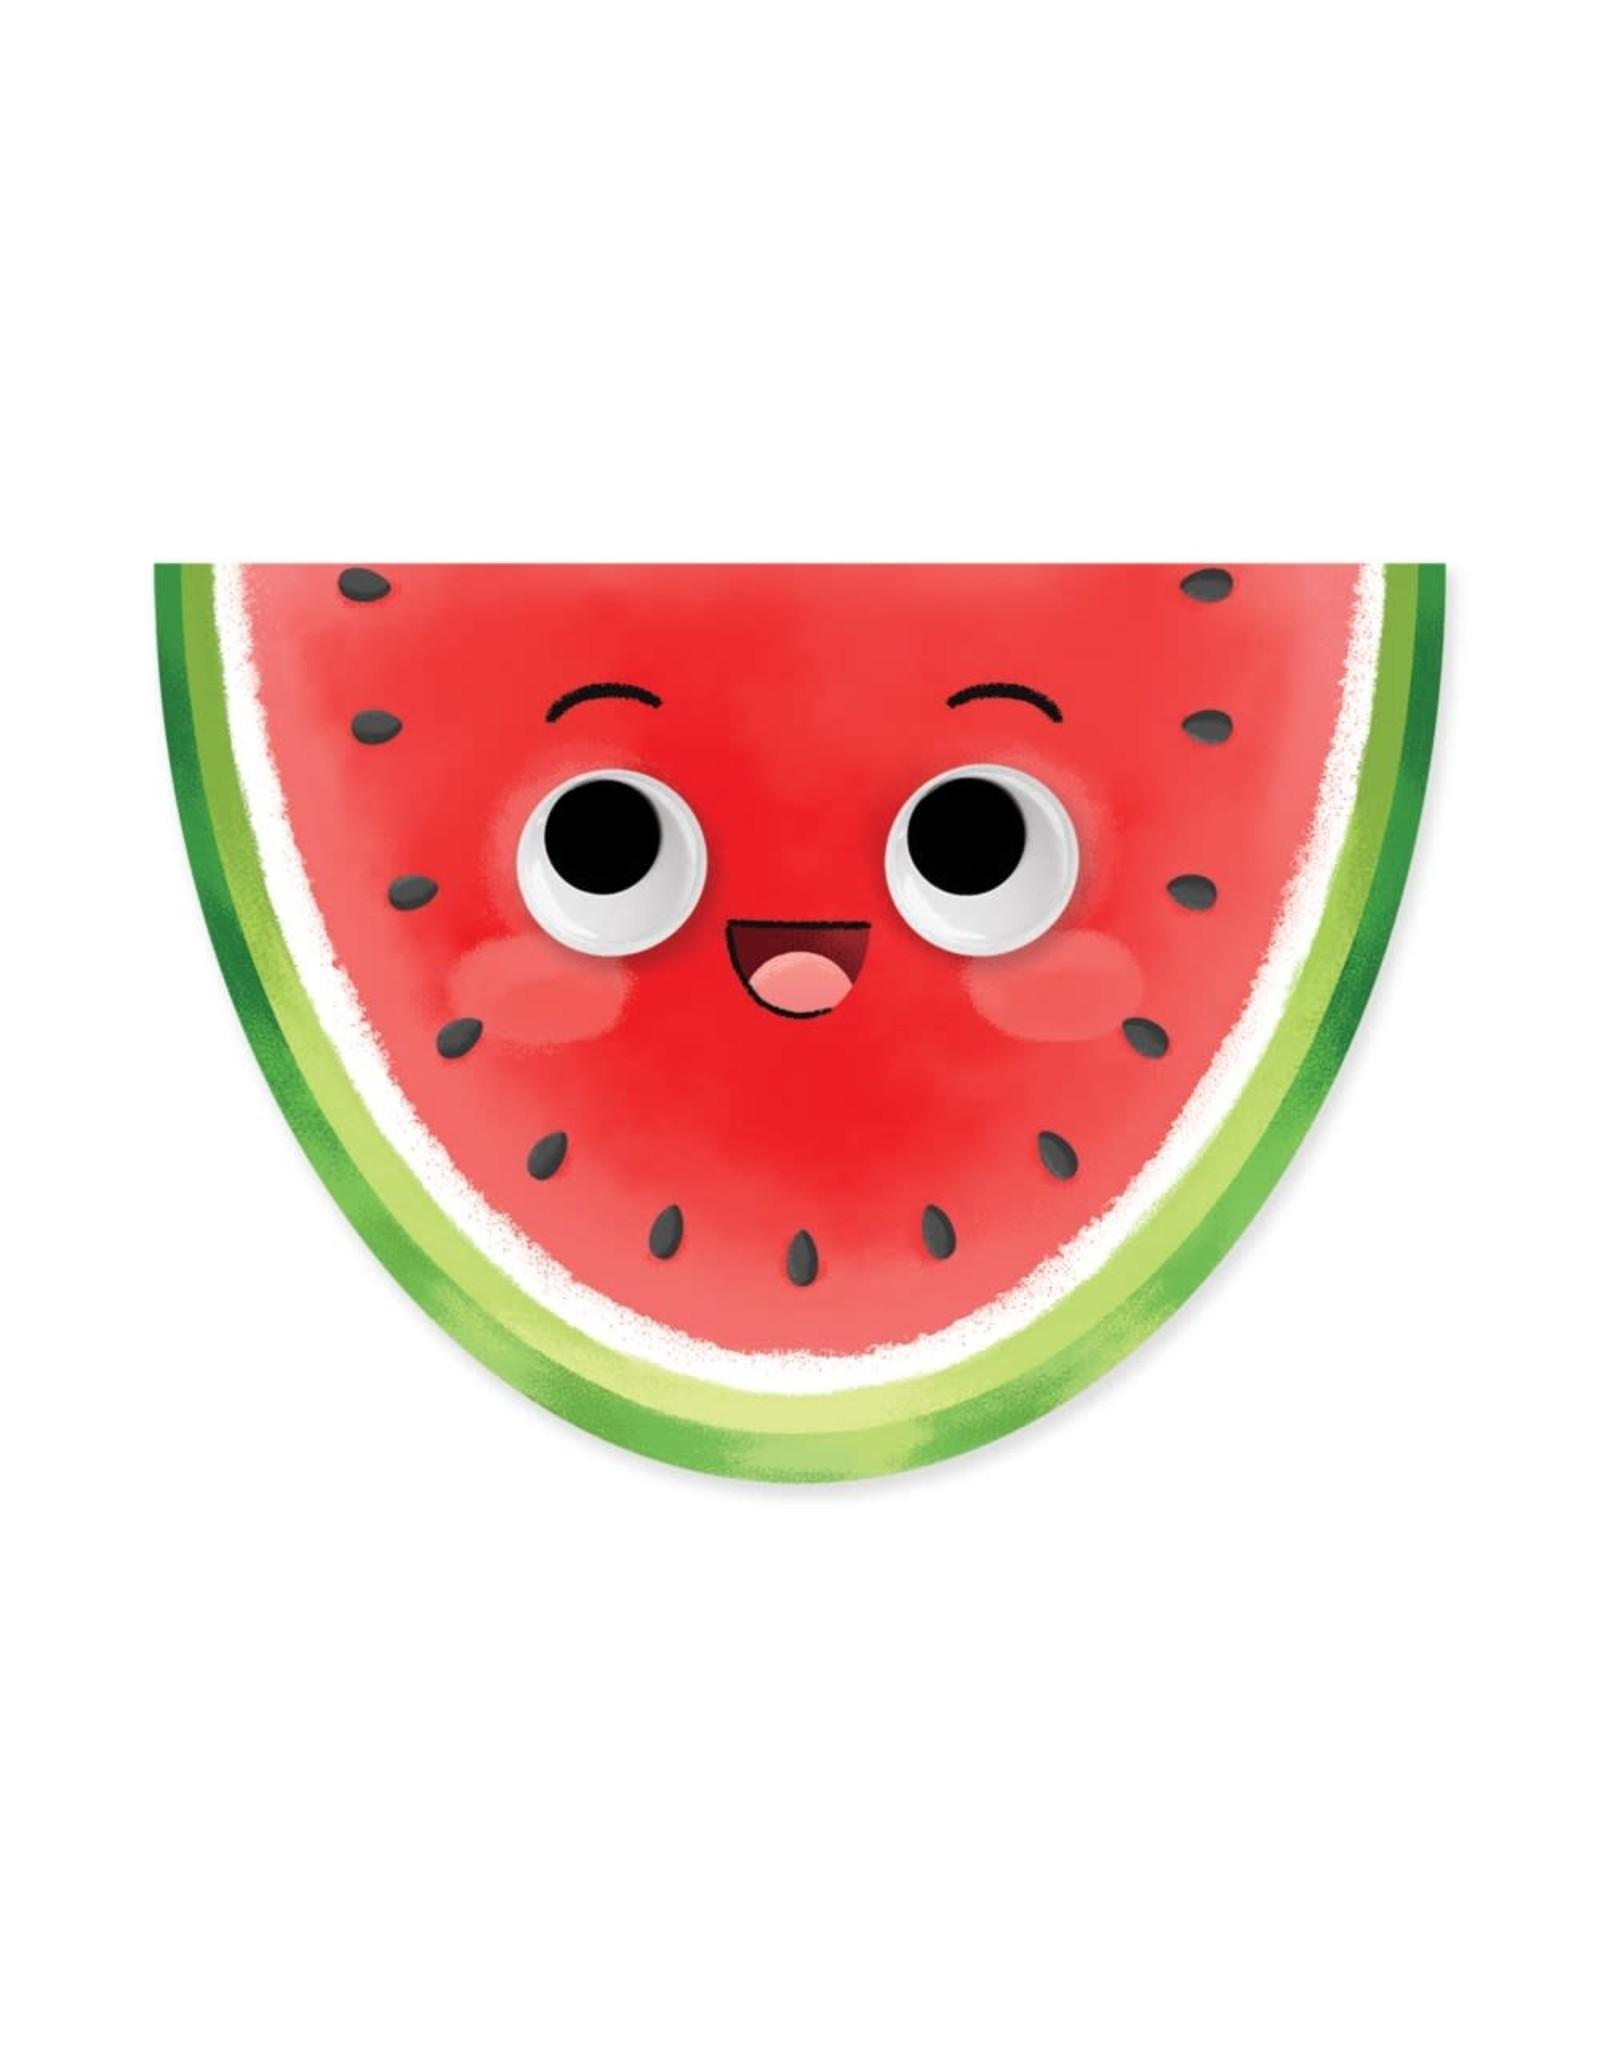 Peaceable Kingdom Watermelon Card